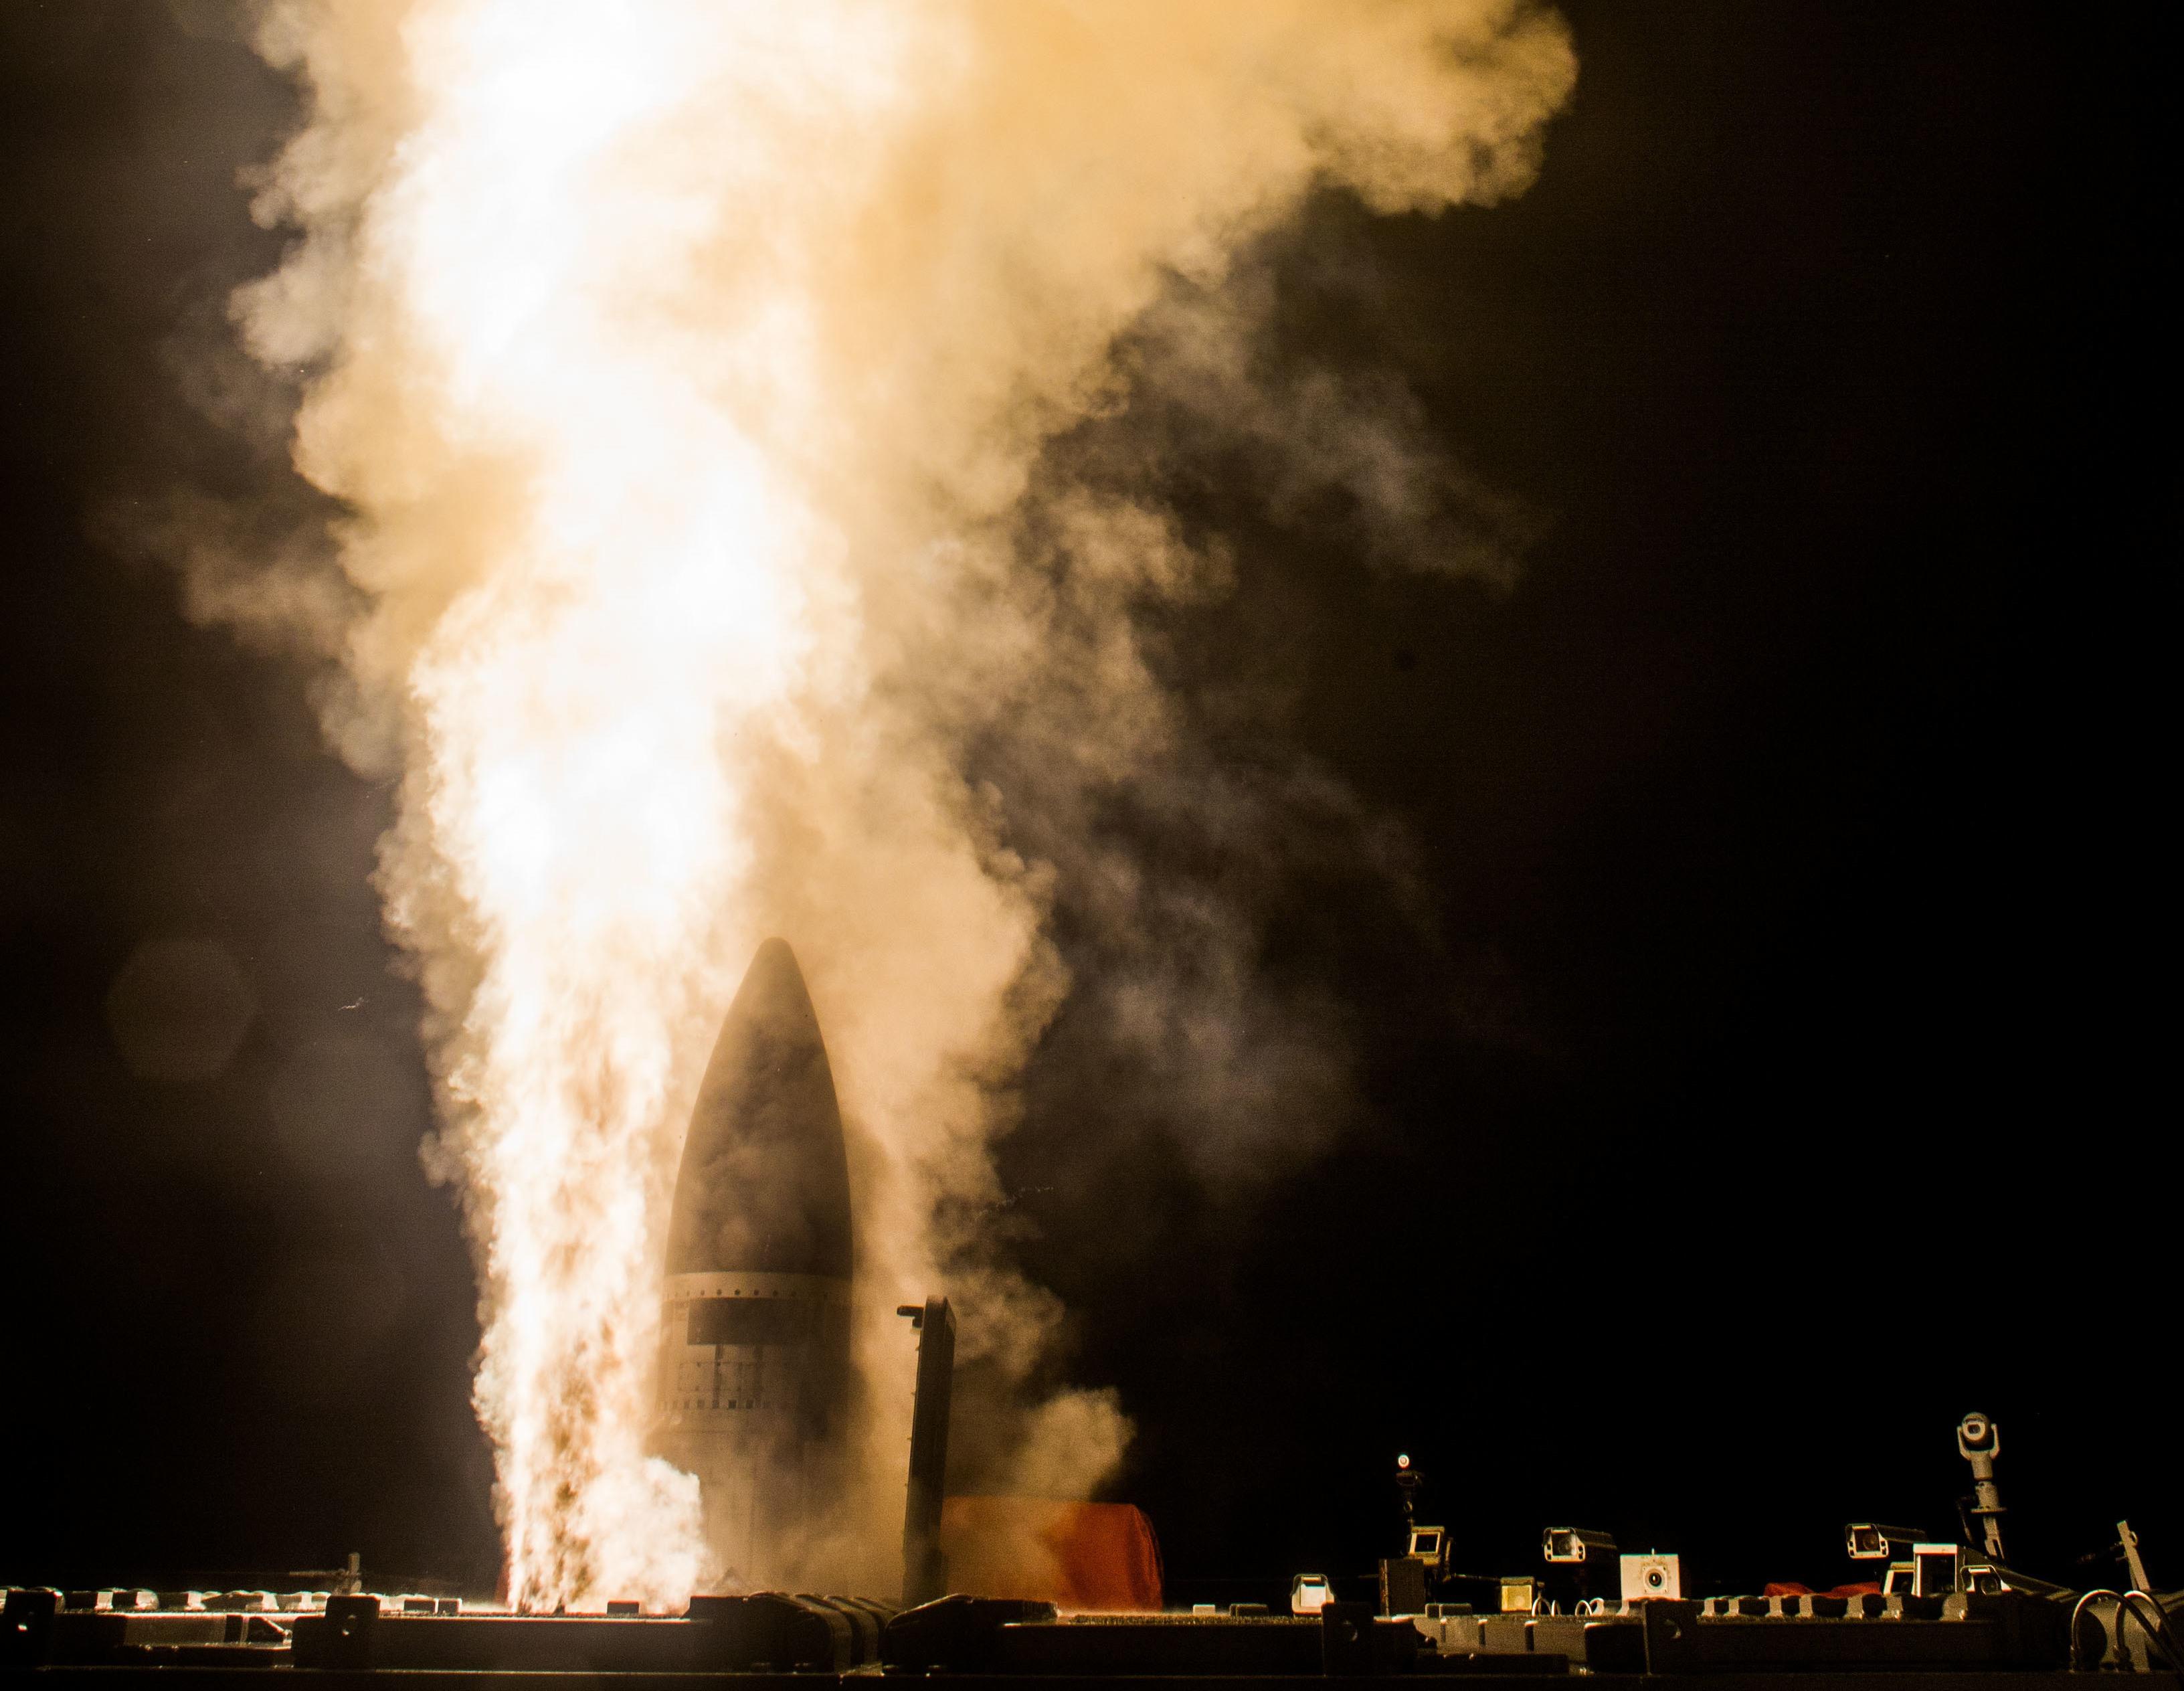 Missile Defense Agency Looking to Intercept Ballistic Targets